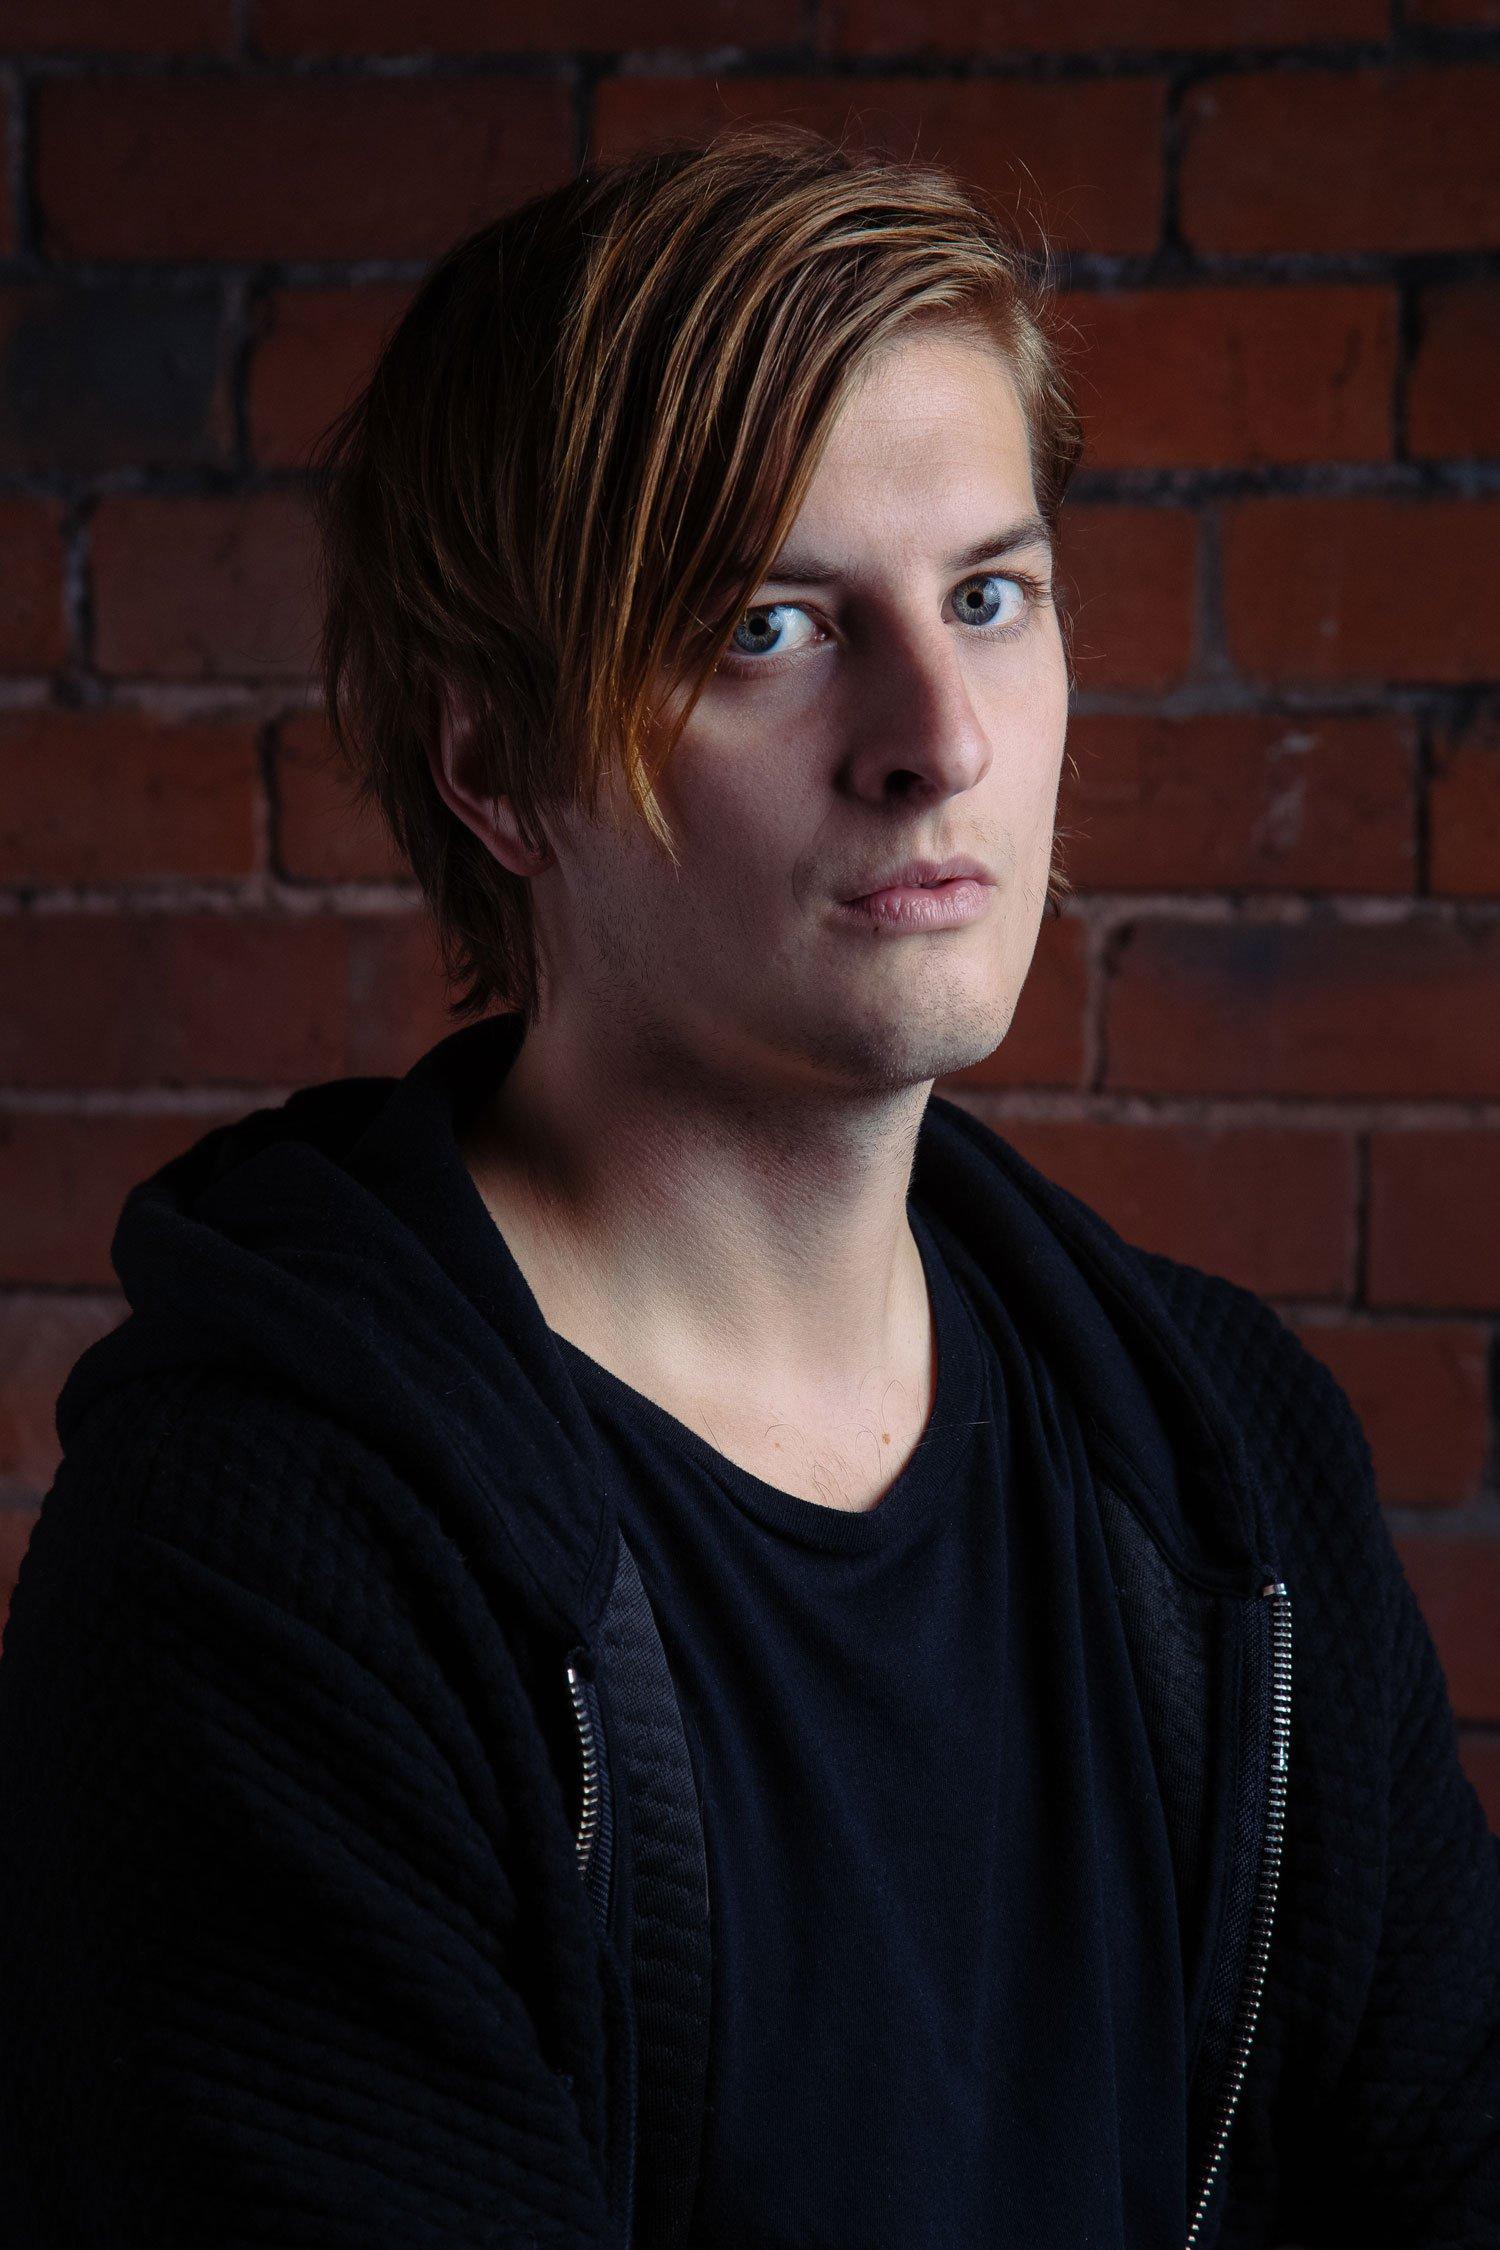 Matt Kean Upset Magazine Portrait